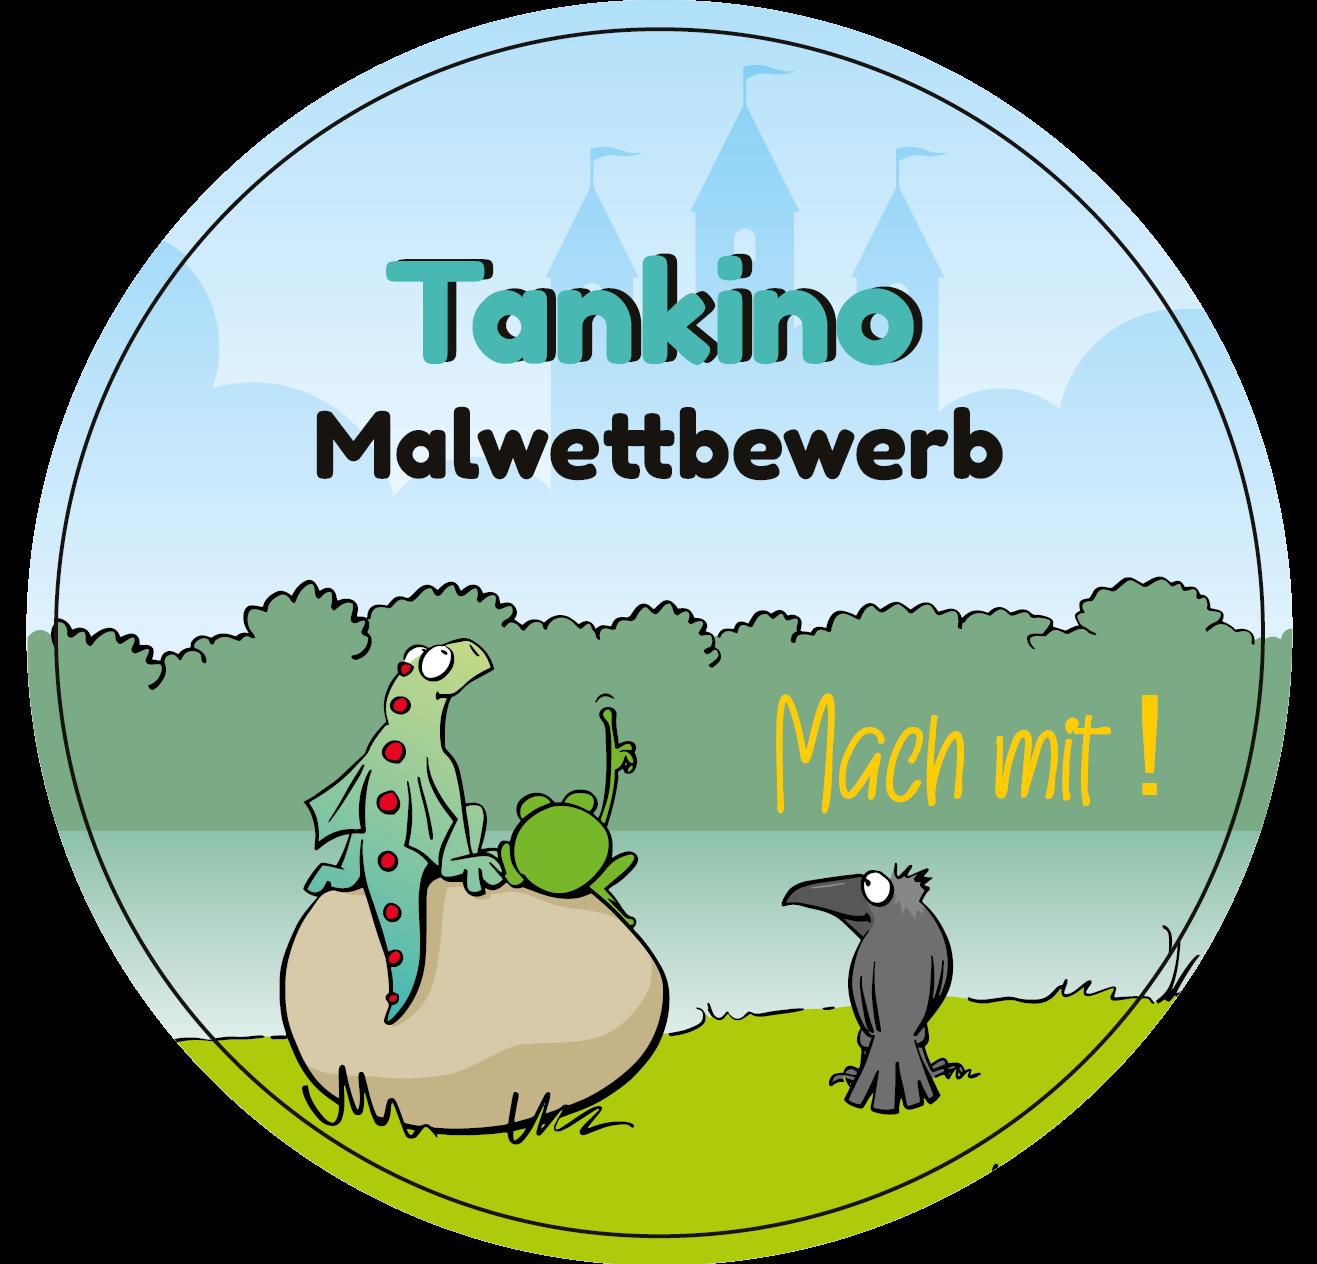 Tankino - Malwettbewerb